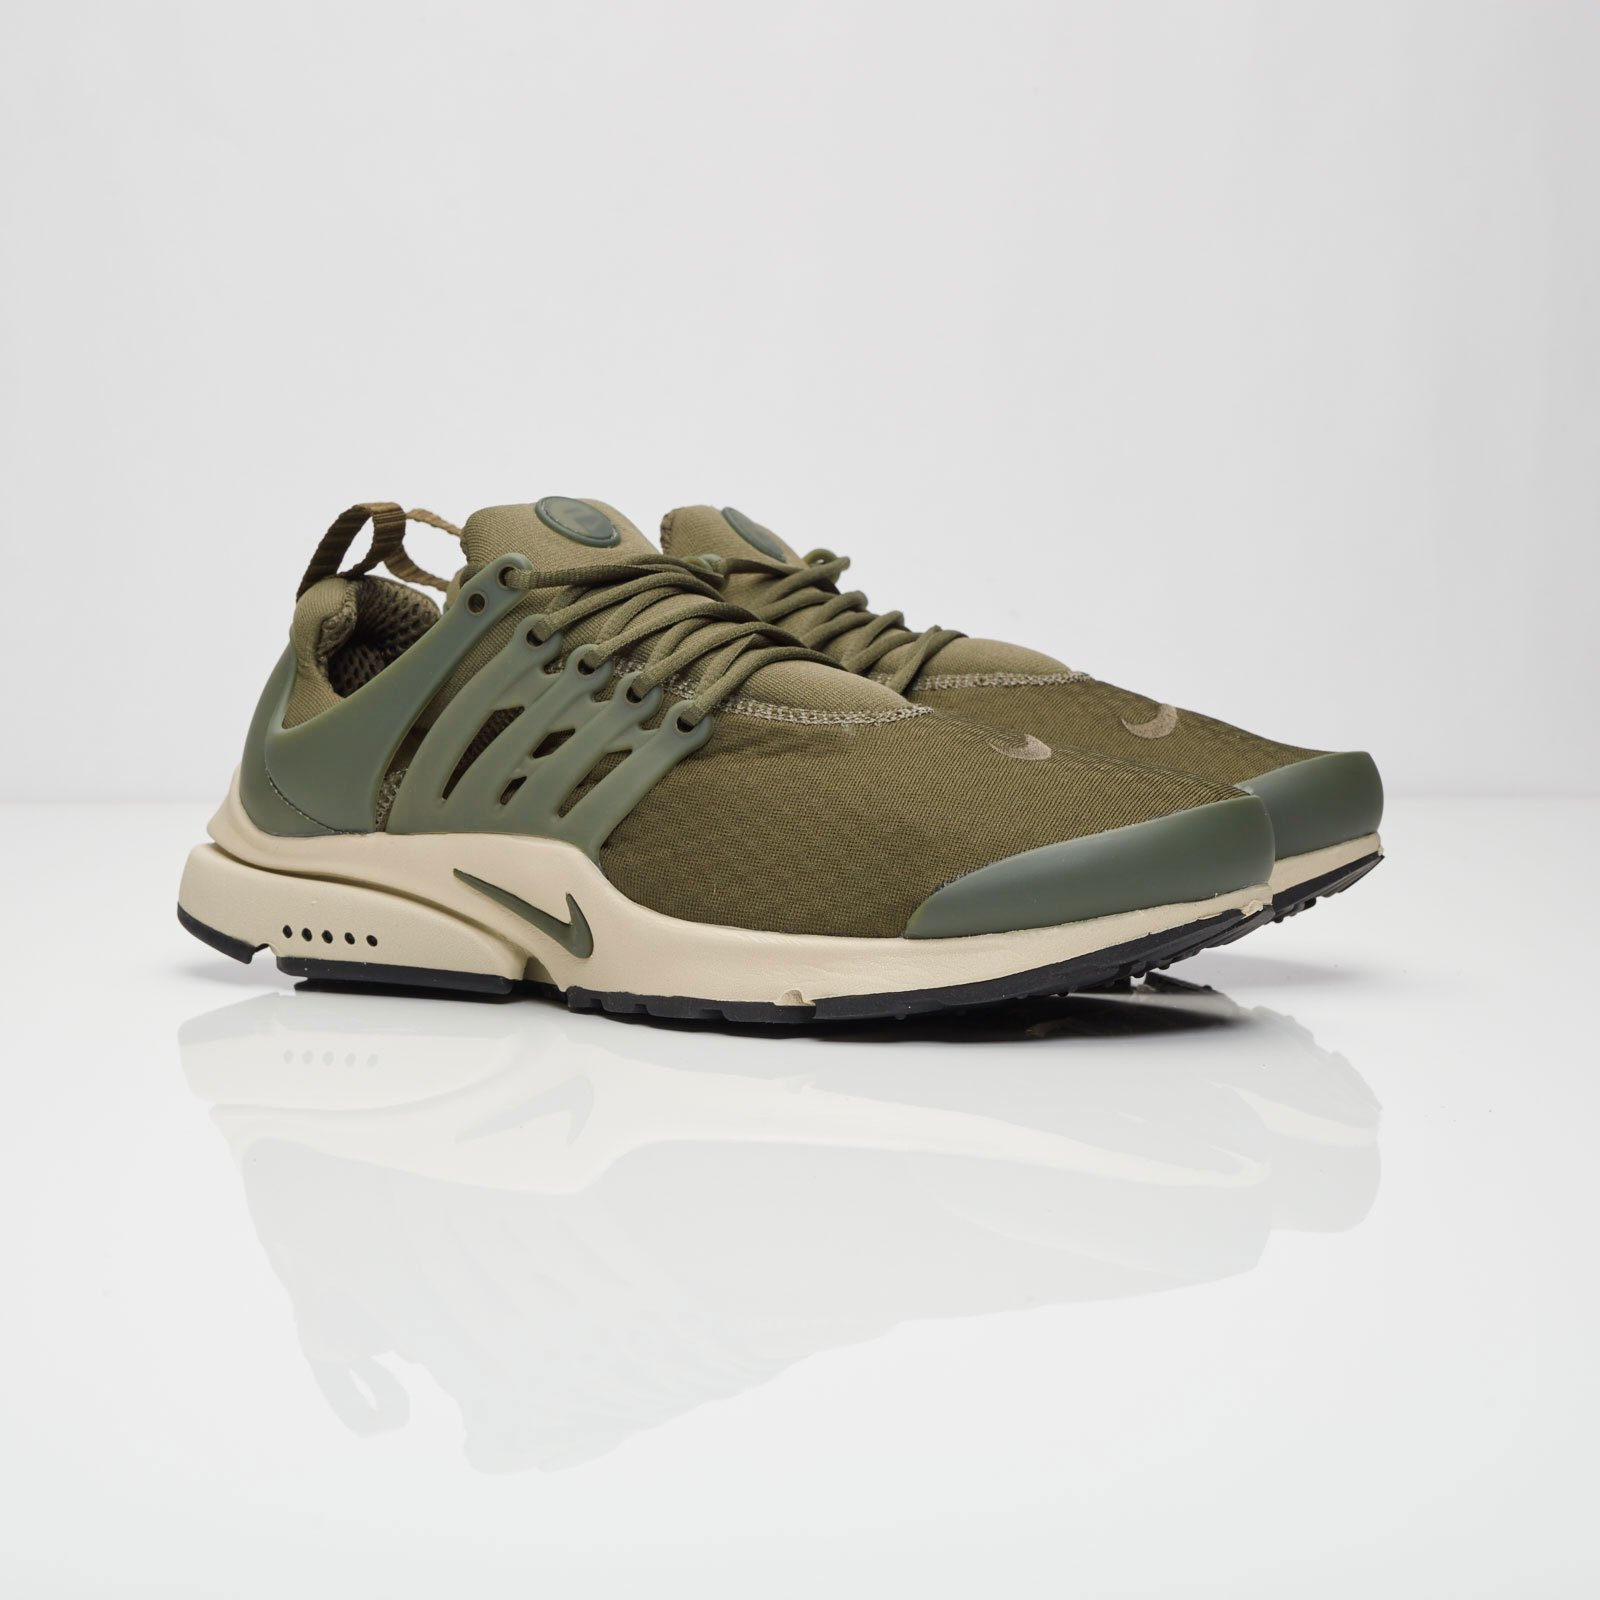 be2e305ec857 Nike Air Presto Essential - 848187-301 - Sneakersnstuff